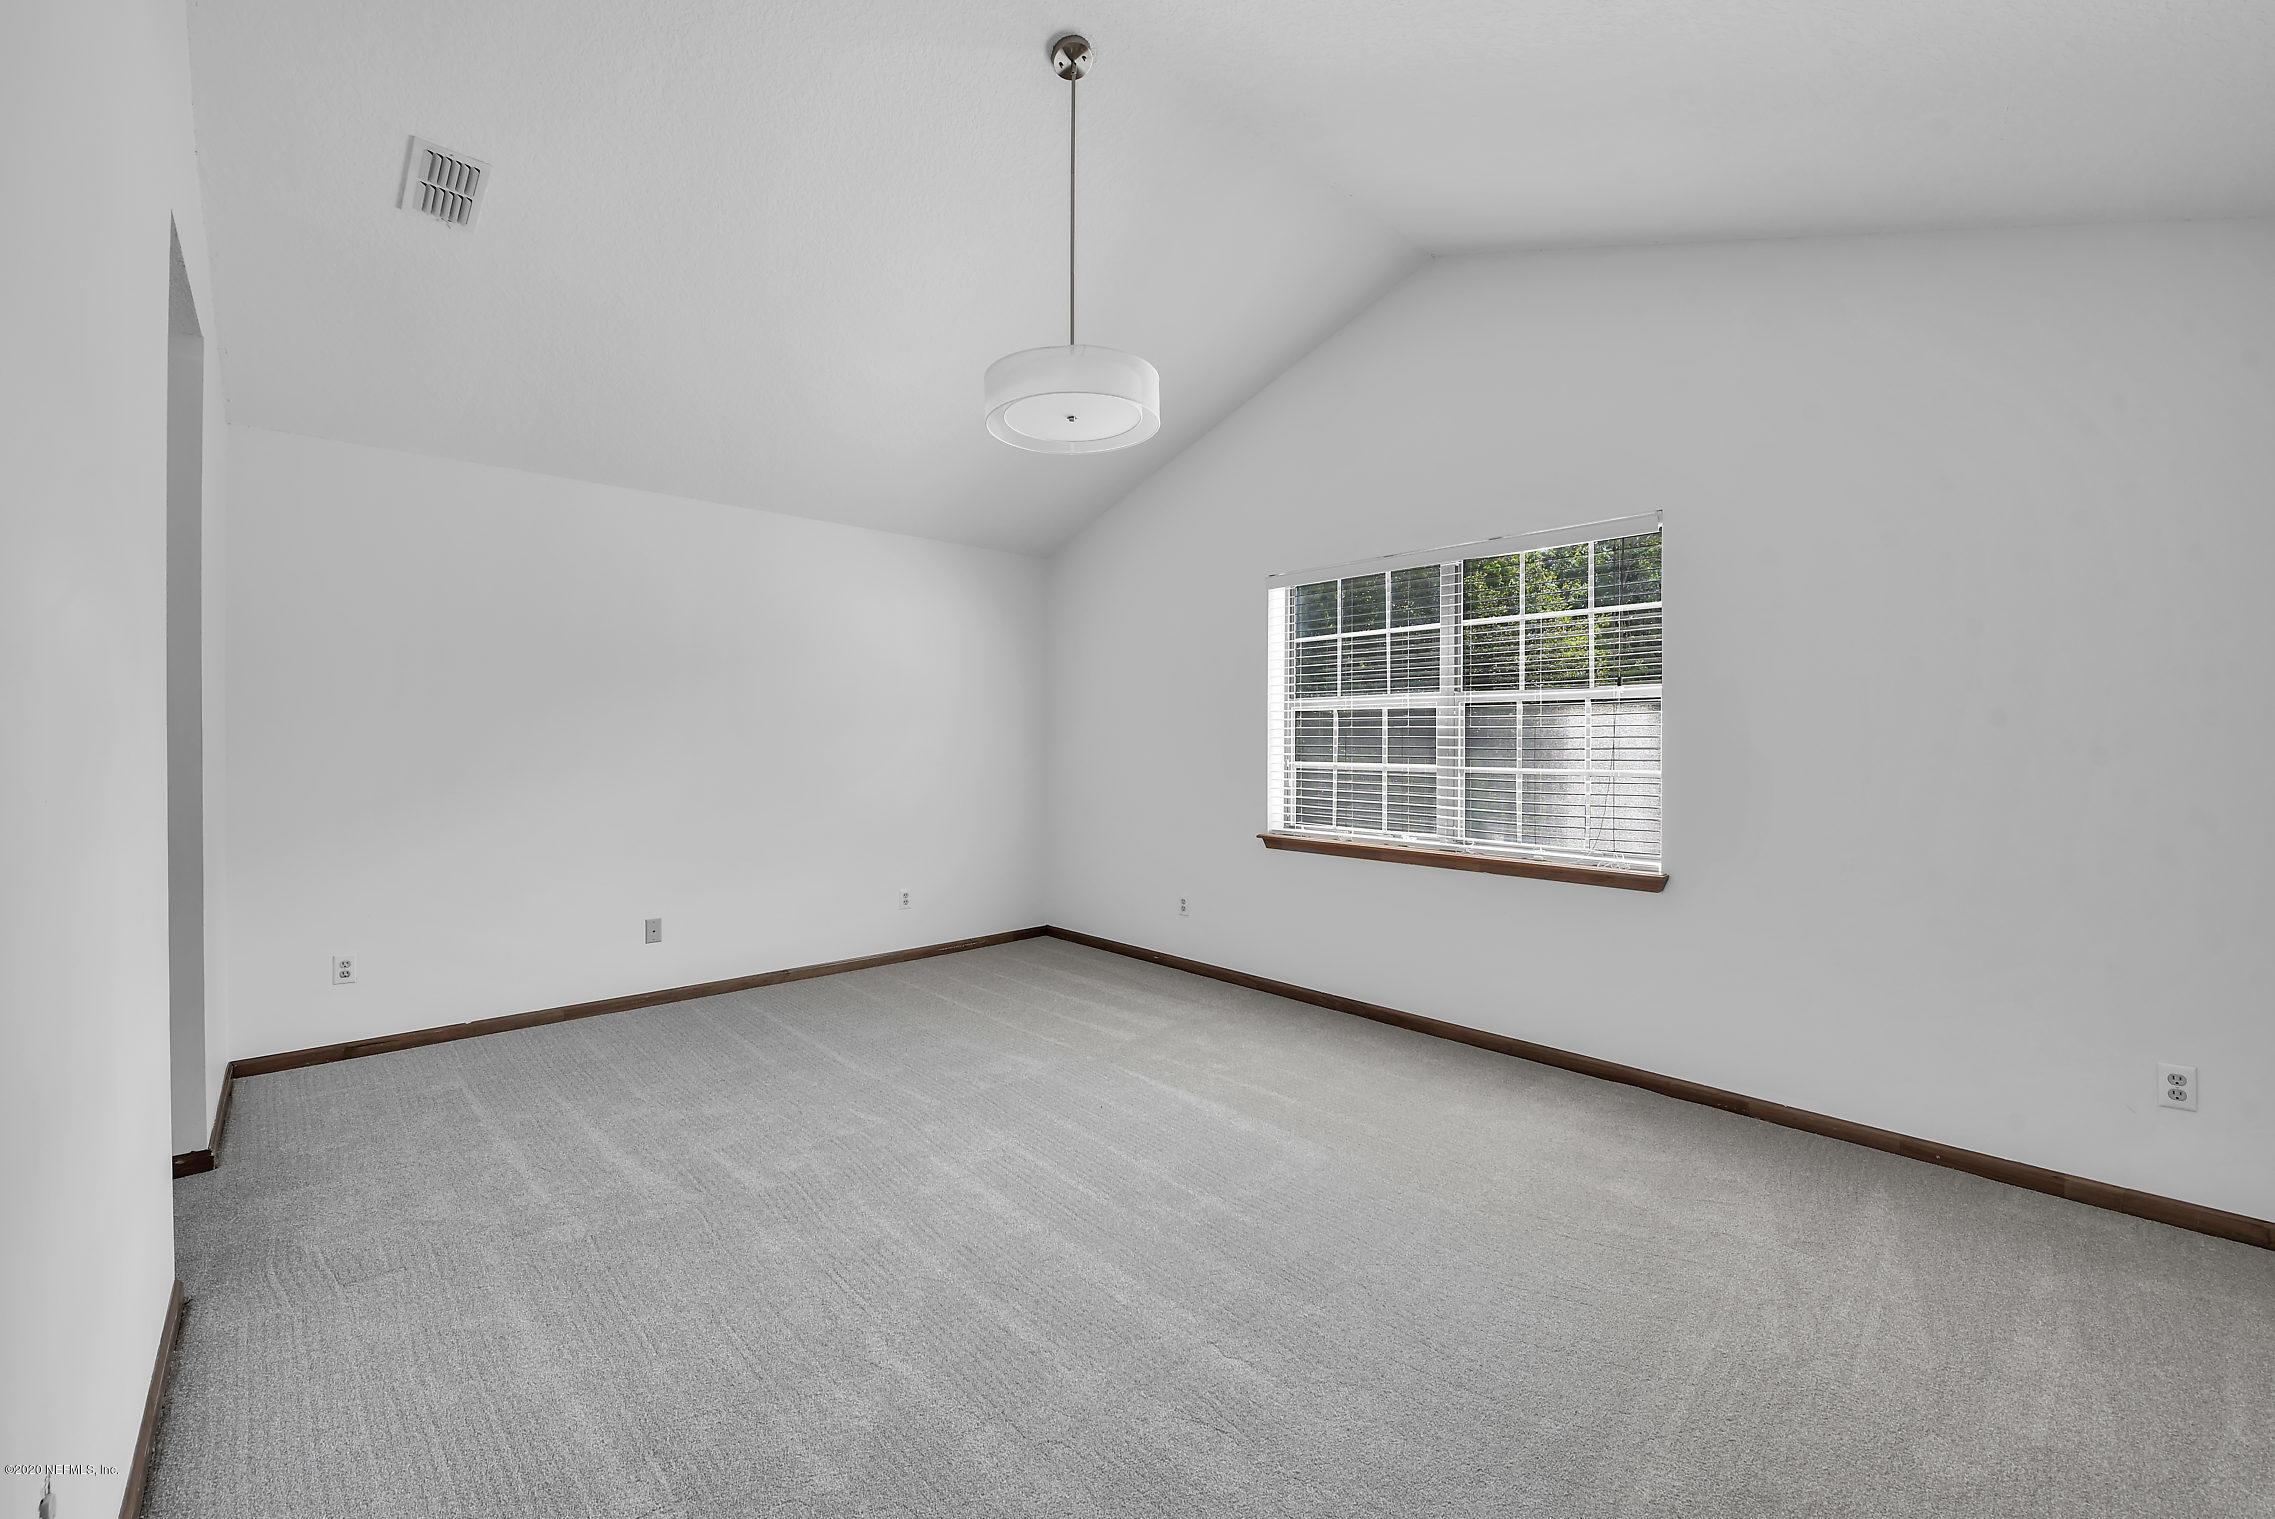 7780 HILSDALE, JACKSONVILLE, FLORIDA 32216, 3 Bedrooms Bedrooms, ,2 BathroomsBathrooms,Residential,For sale,HILSDALE,1047585